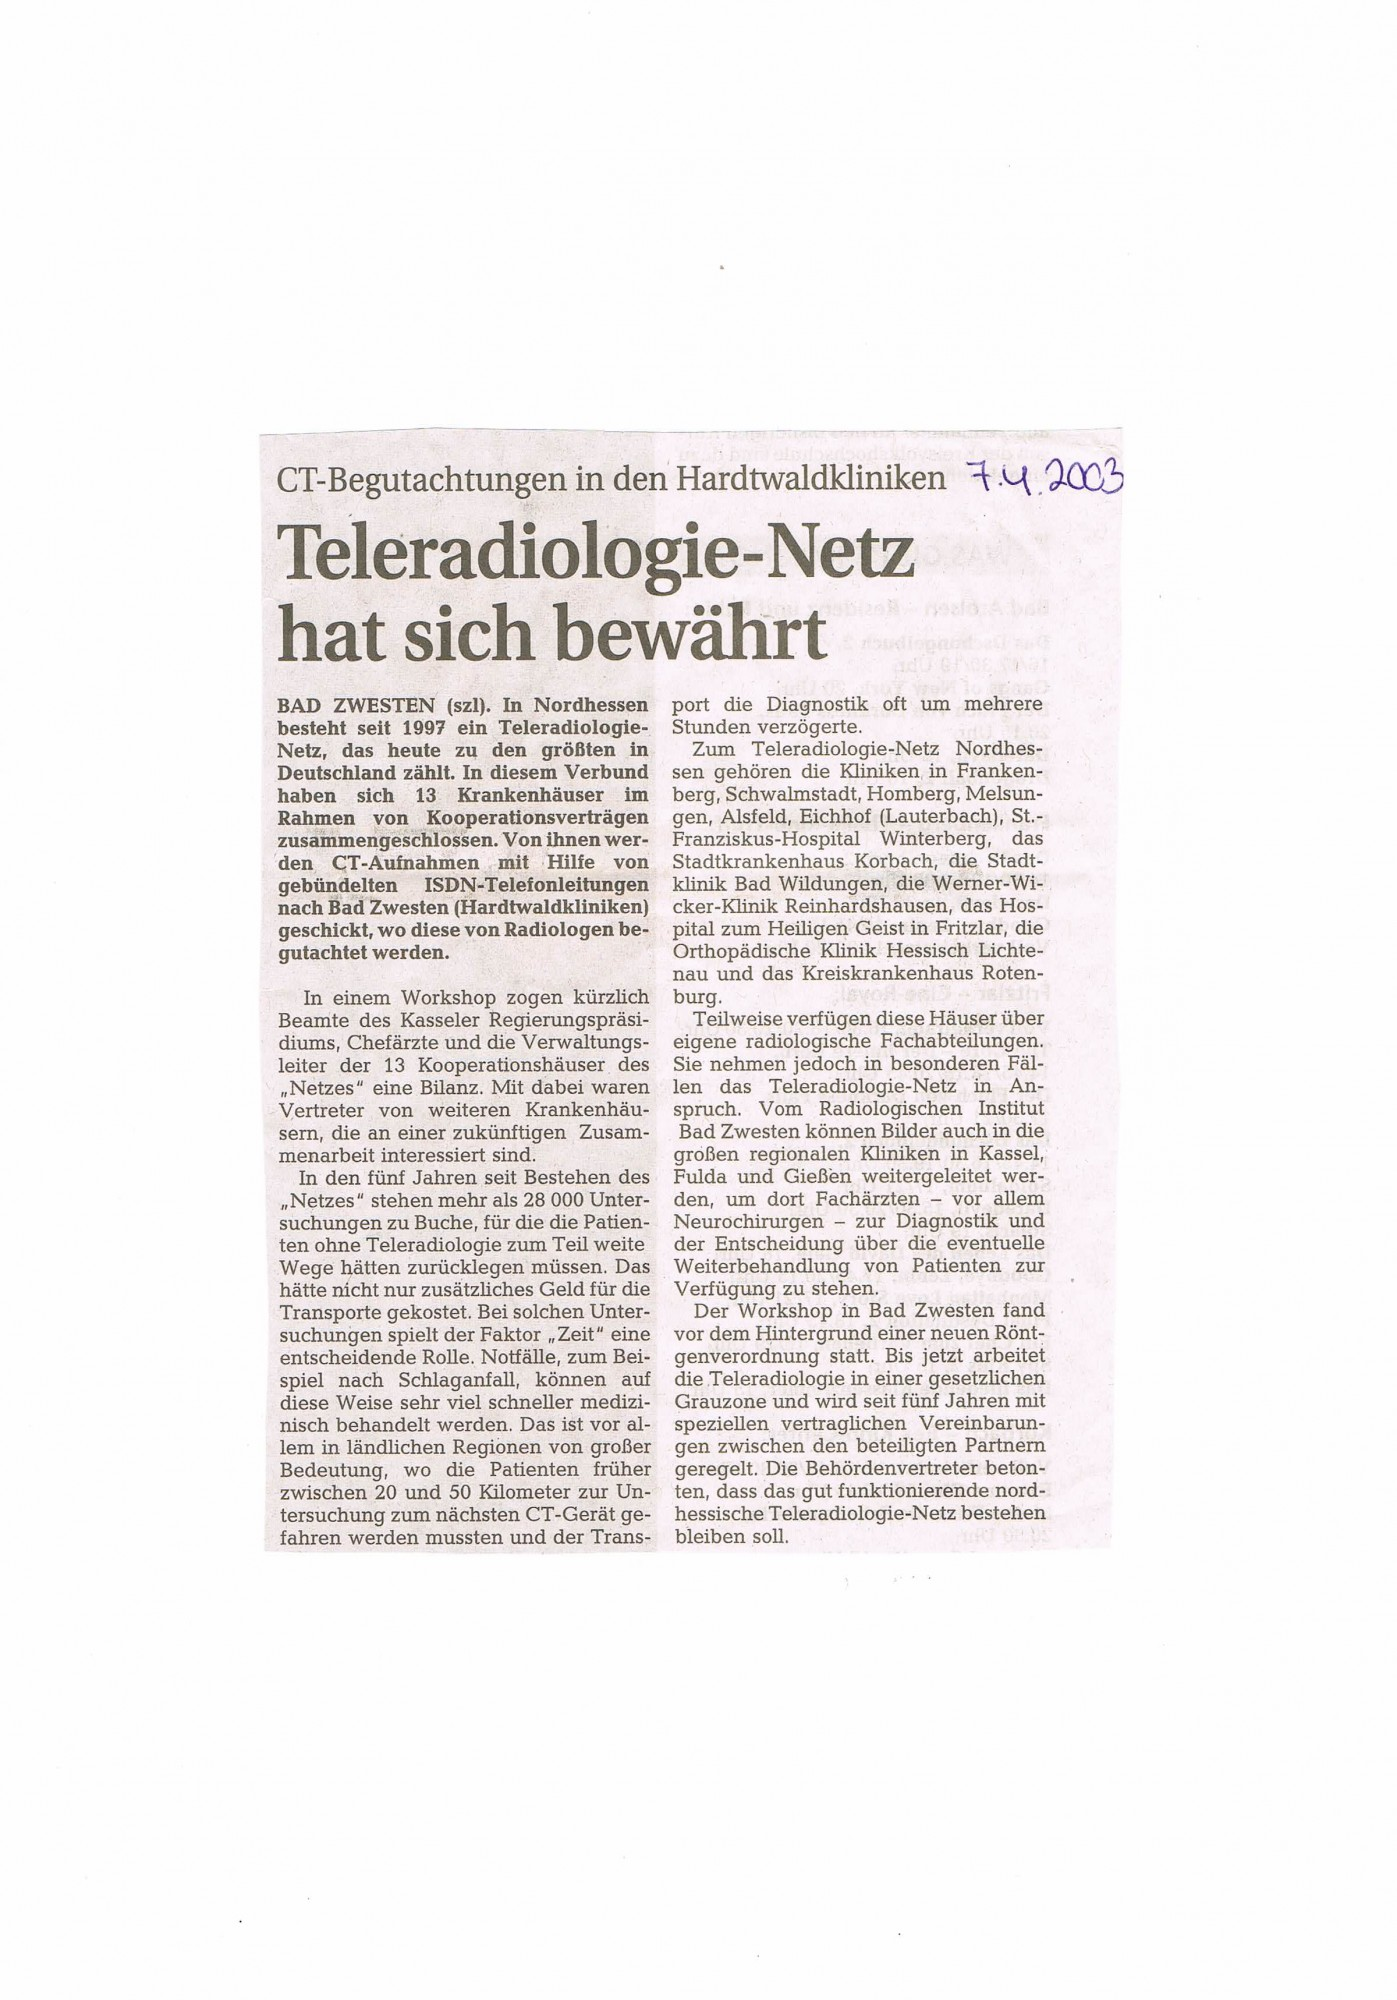 2003-04-07 Teleradiologie-Netz hat sich bewährt-001